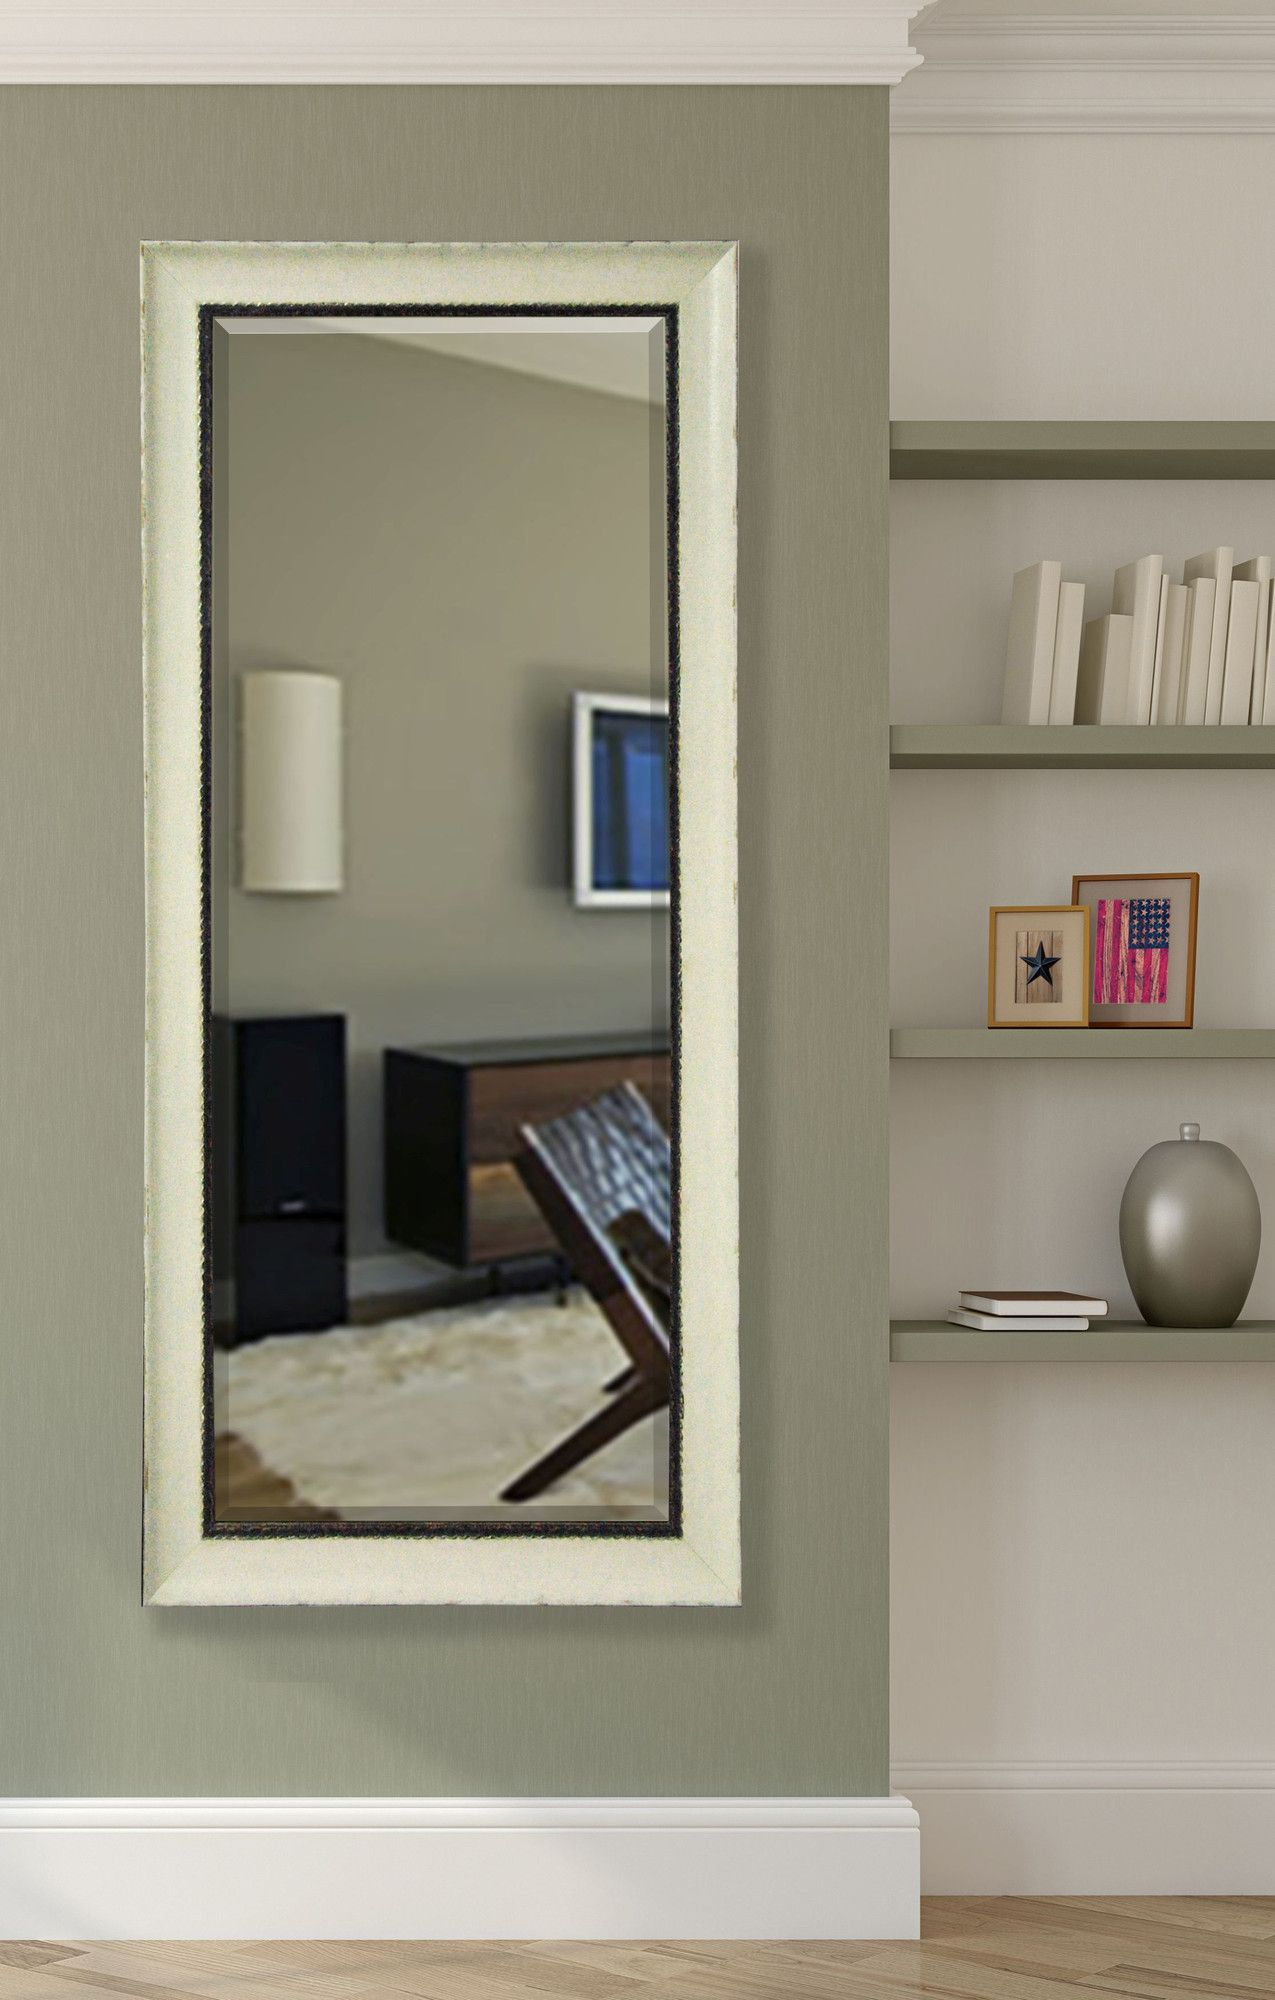 Peyton JaLee Jaded Extra Tall Floor Mirror   Home decor   Pinterest ...